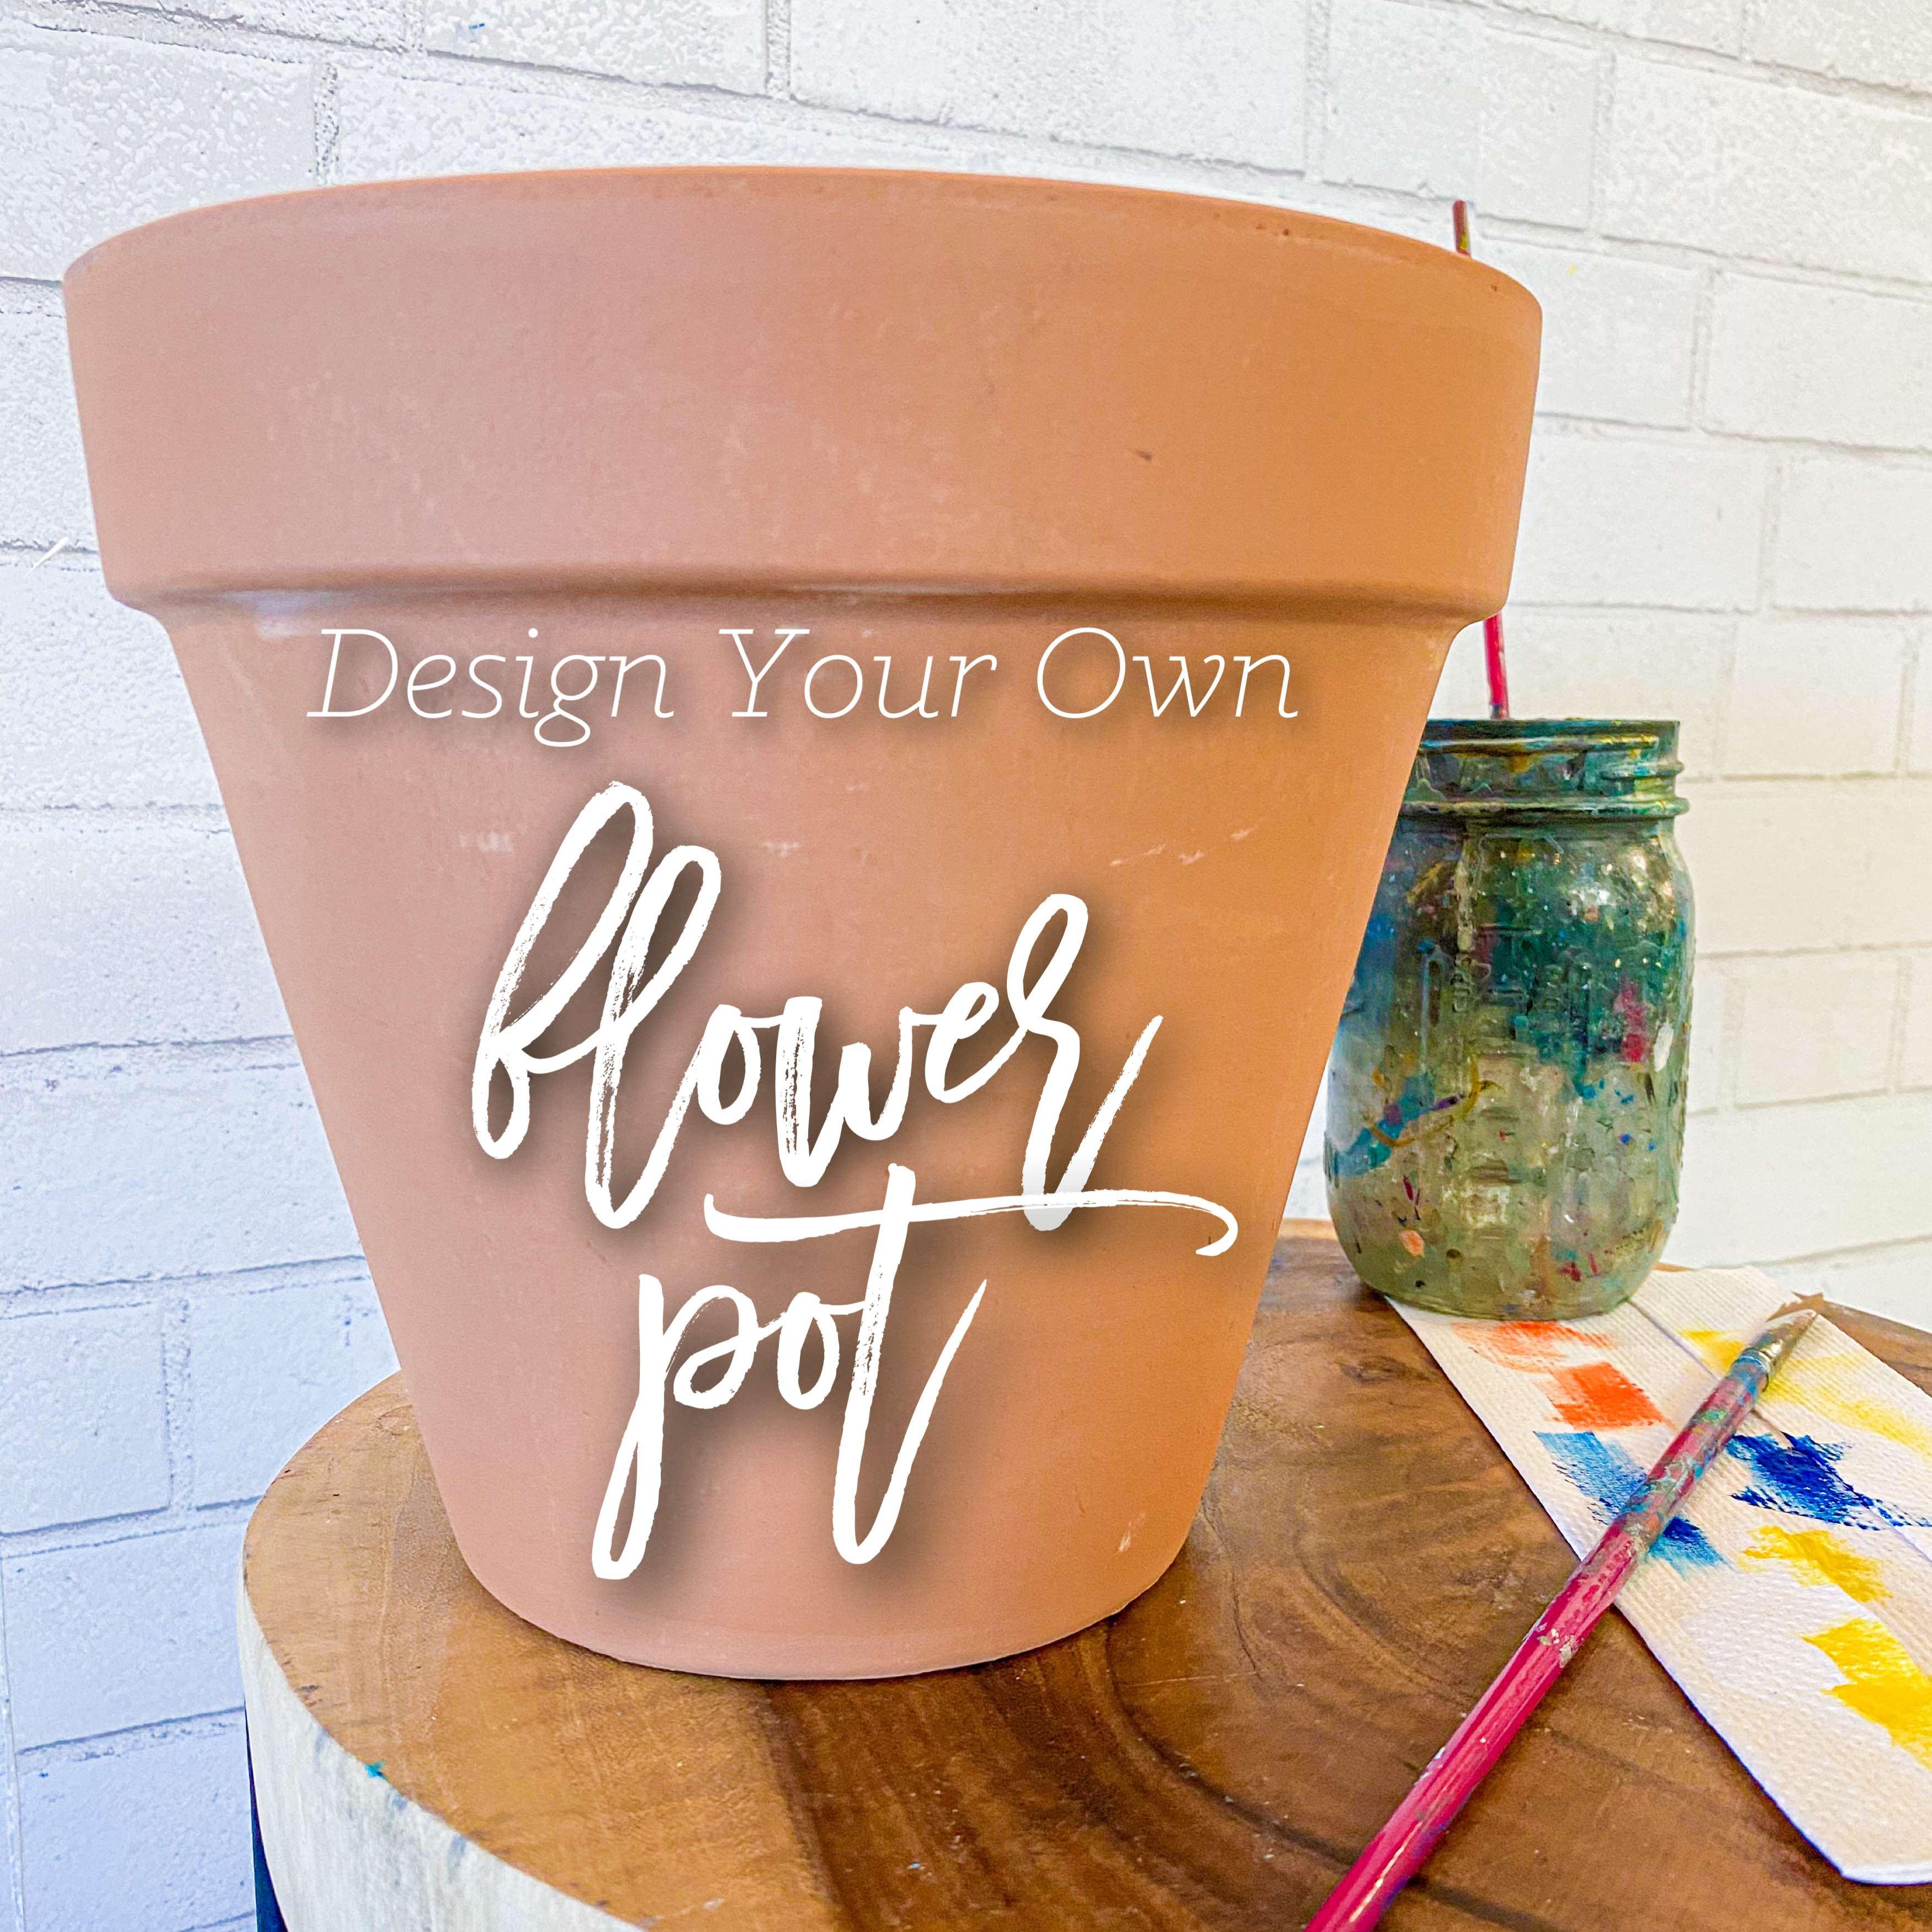 Design Your Own Flower Pot at Floyd's 1921